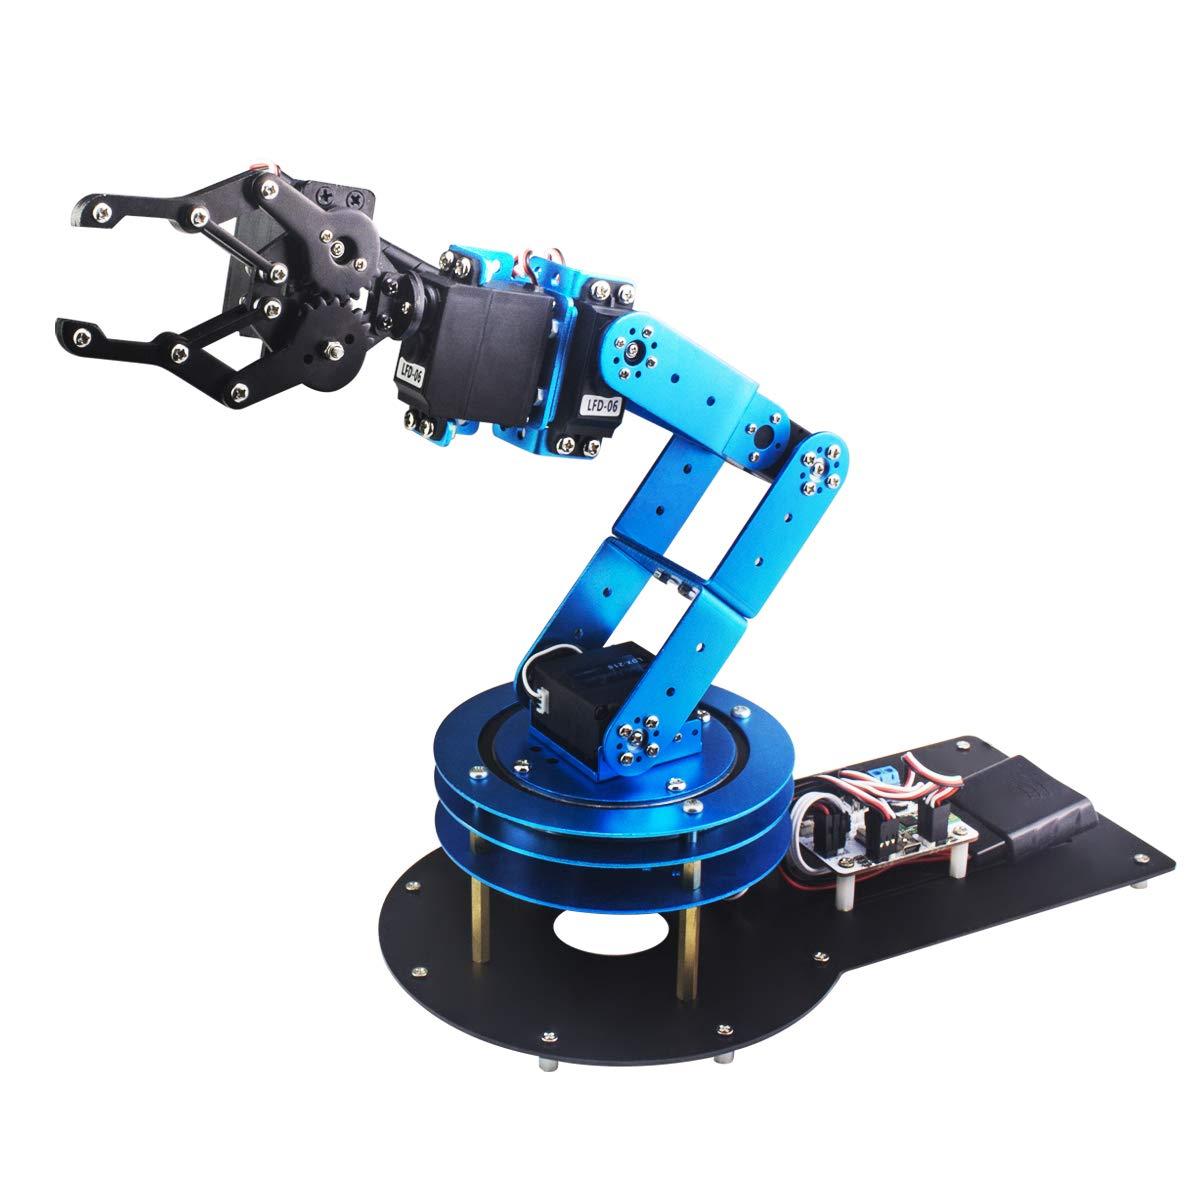 Robot Educativo para armar y programar LewanSoul c